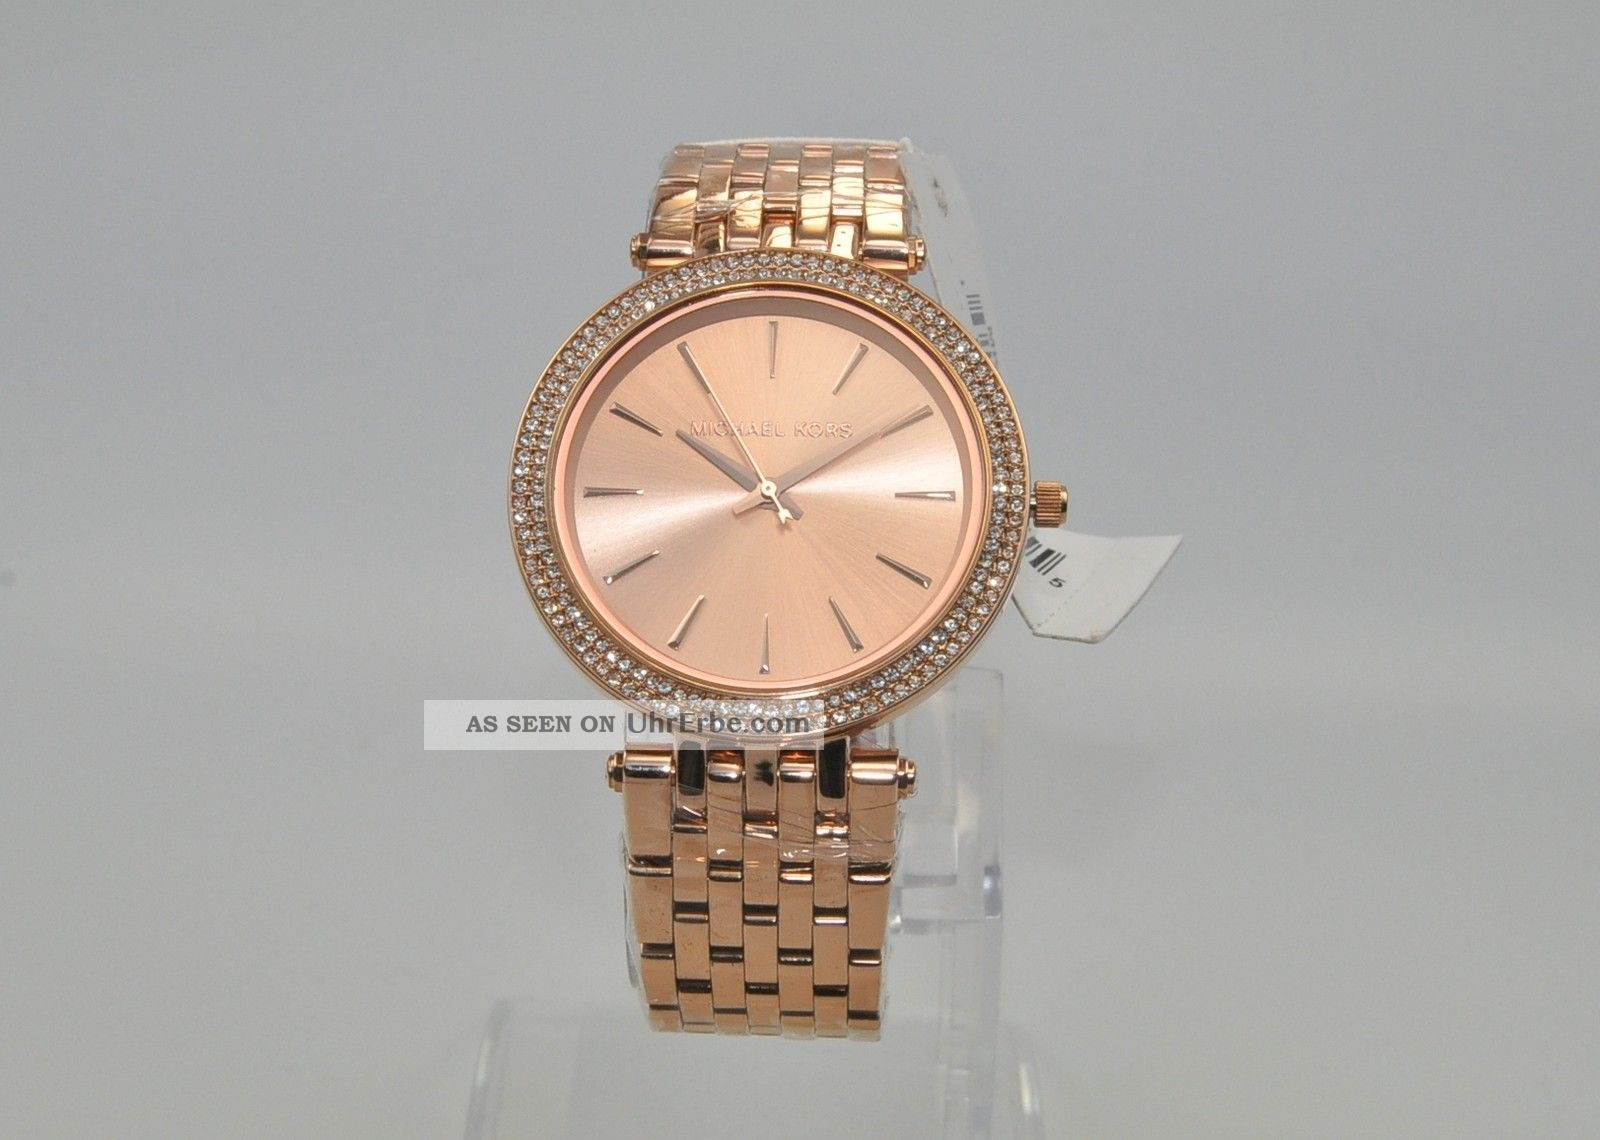 Michael Kors Mk3192 Damenuhr Armbanduhr Uhr Edelstahl Rose Armbanduhren Bild